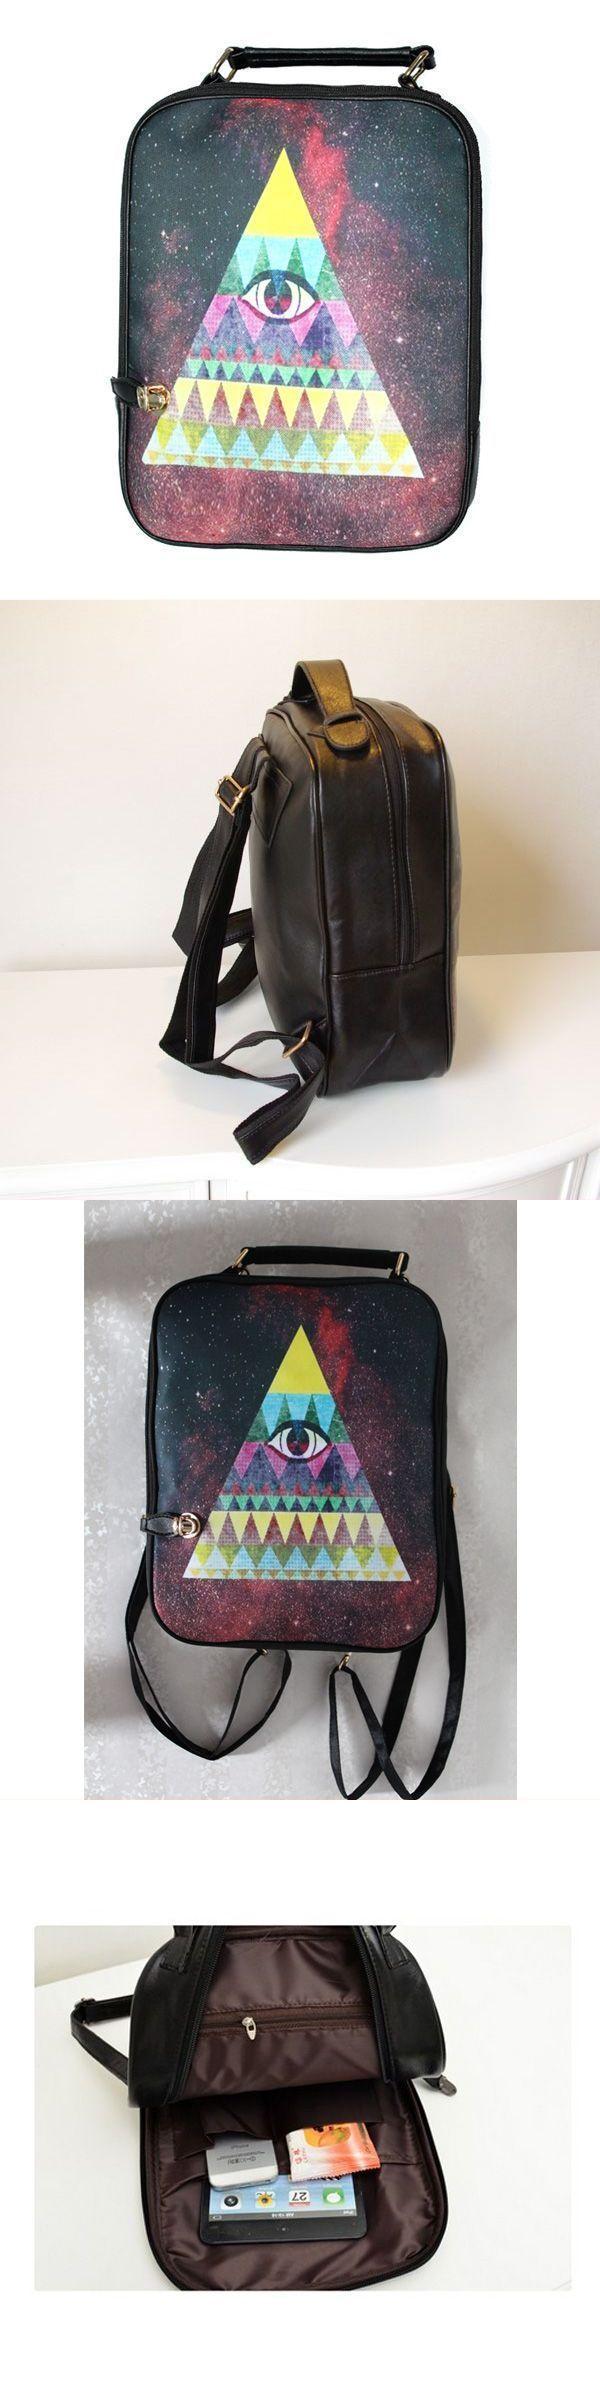 Girls harajuku style canvas eye zipper backpack students schoolbag backpack you can color #backpack #buddies #backpack #ice #chest #gregory #z #backpack #u-pick #backpack